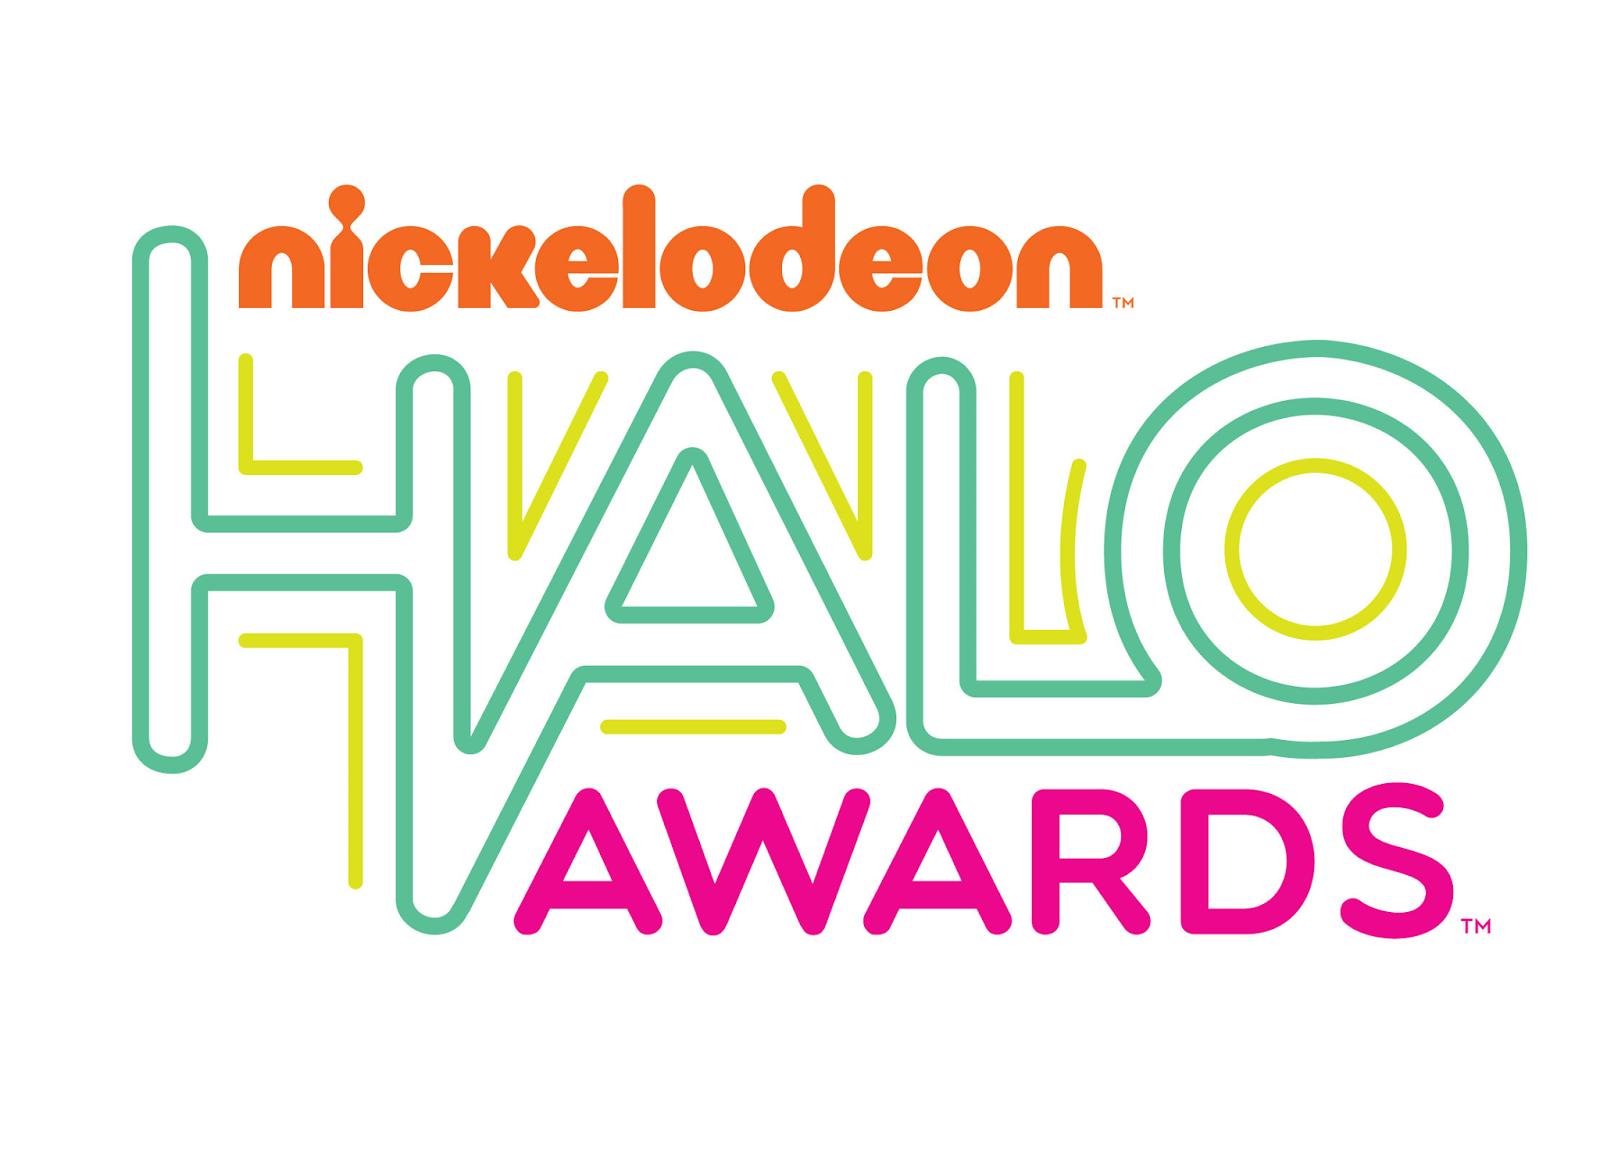 Nickelodeon Halo Awards Logo